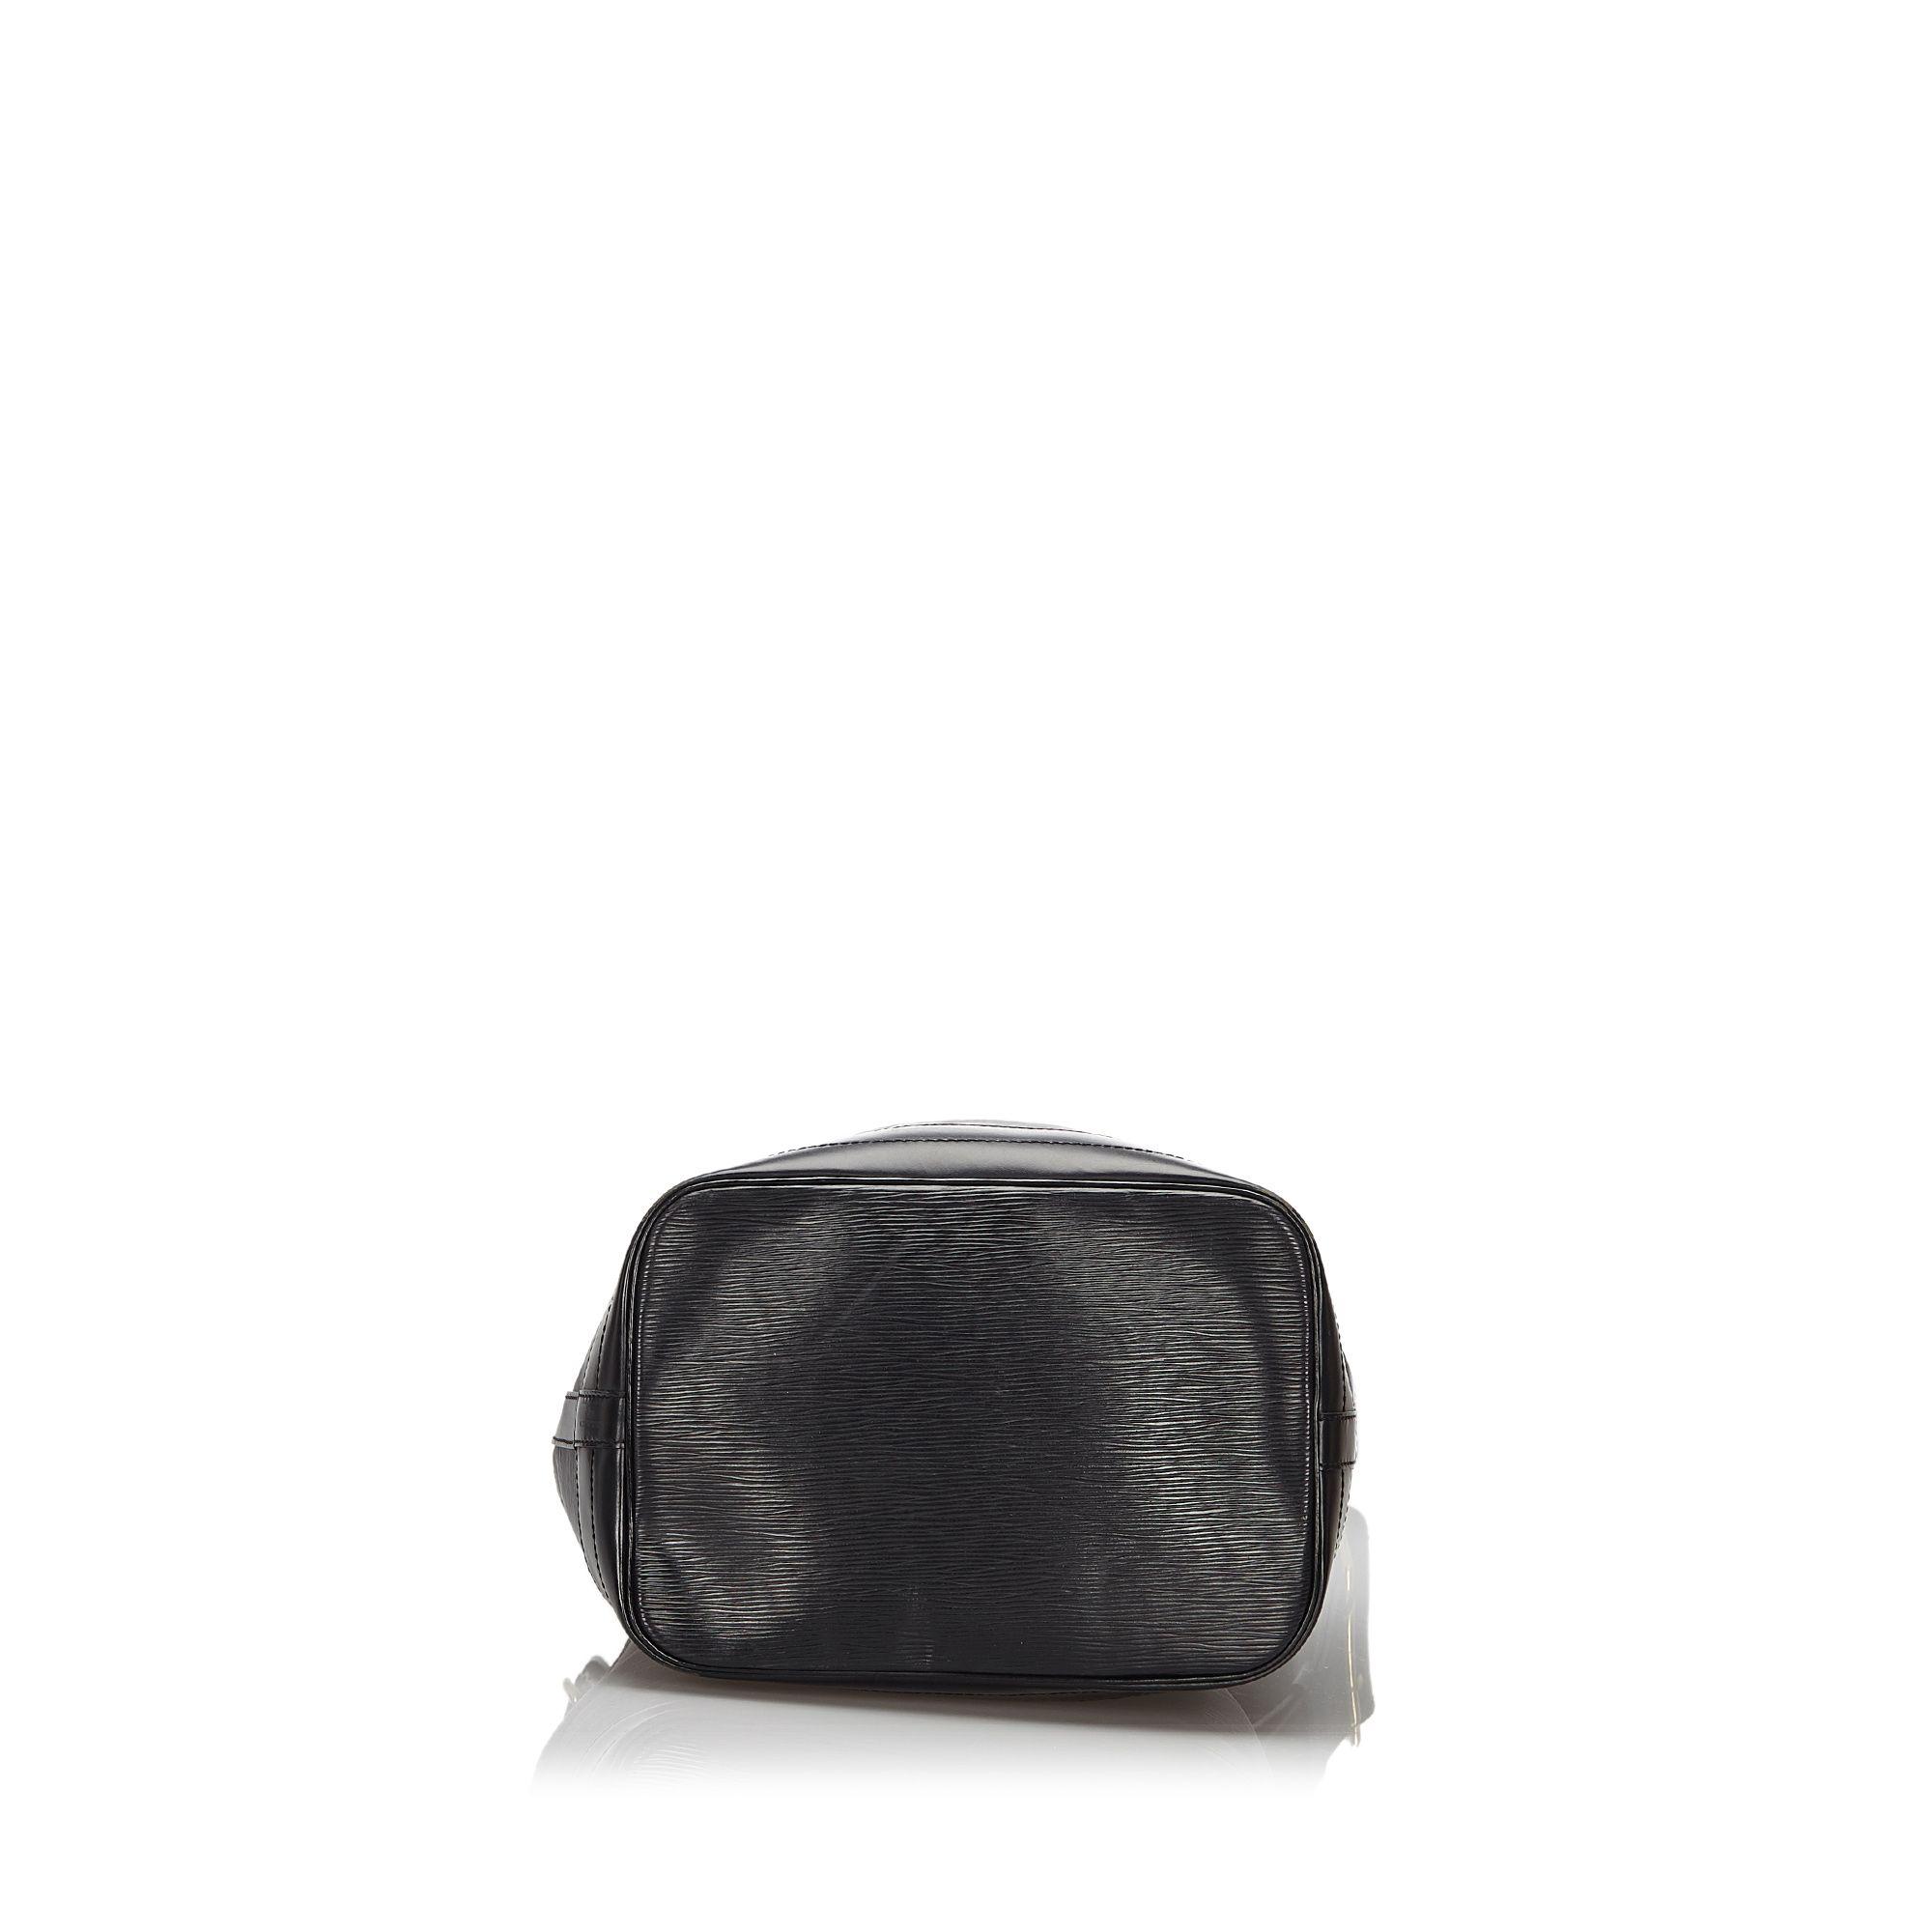 Vintage Louis Vuitton Epi Noe Black